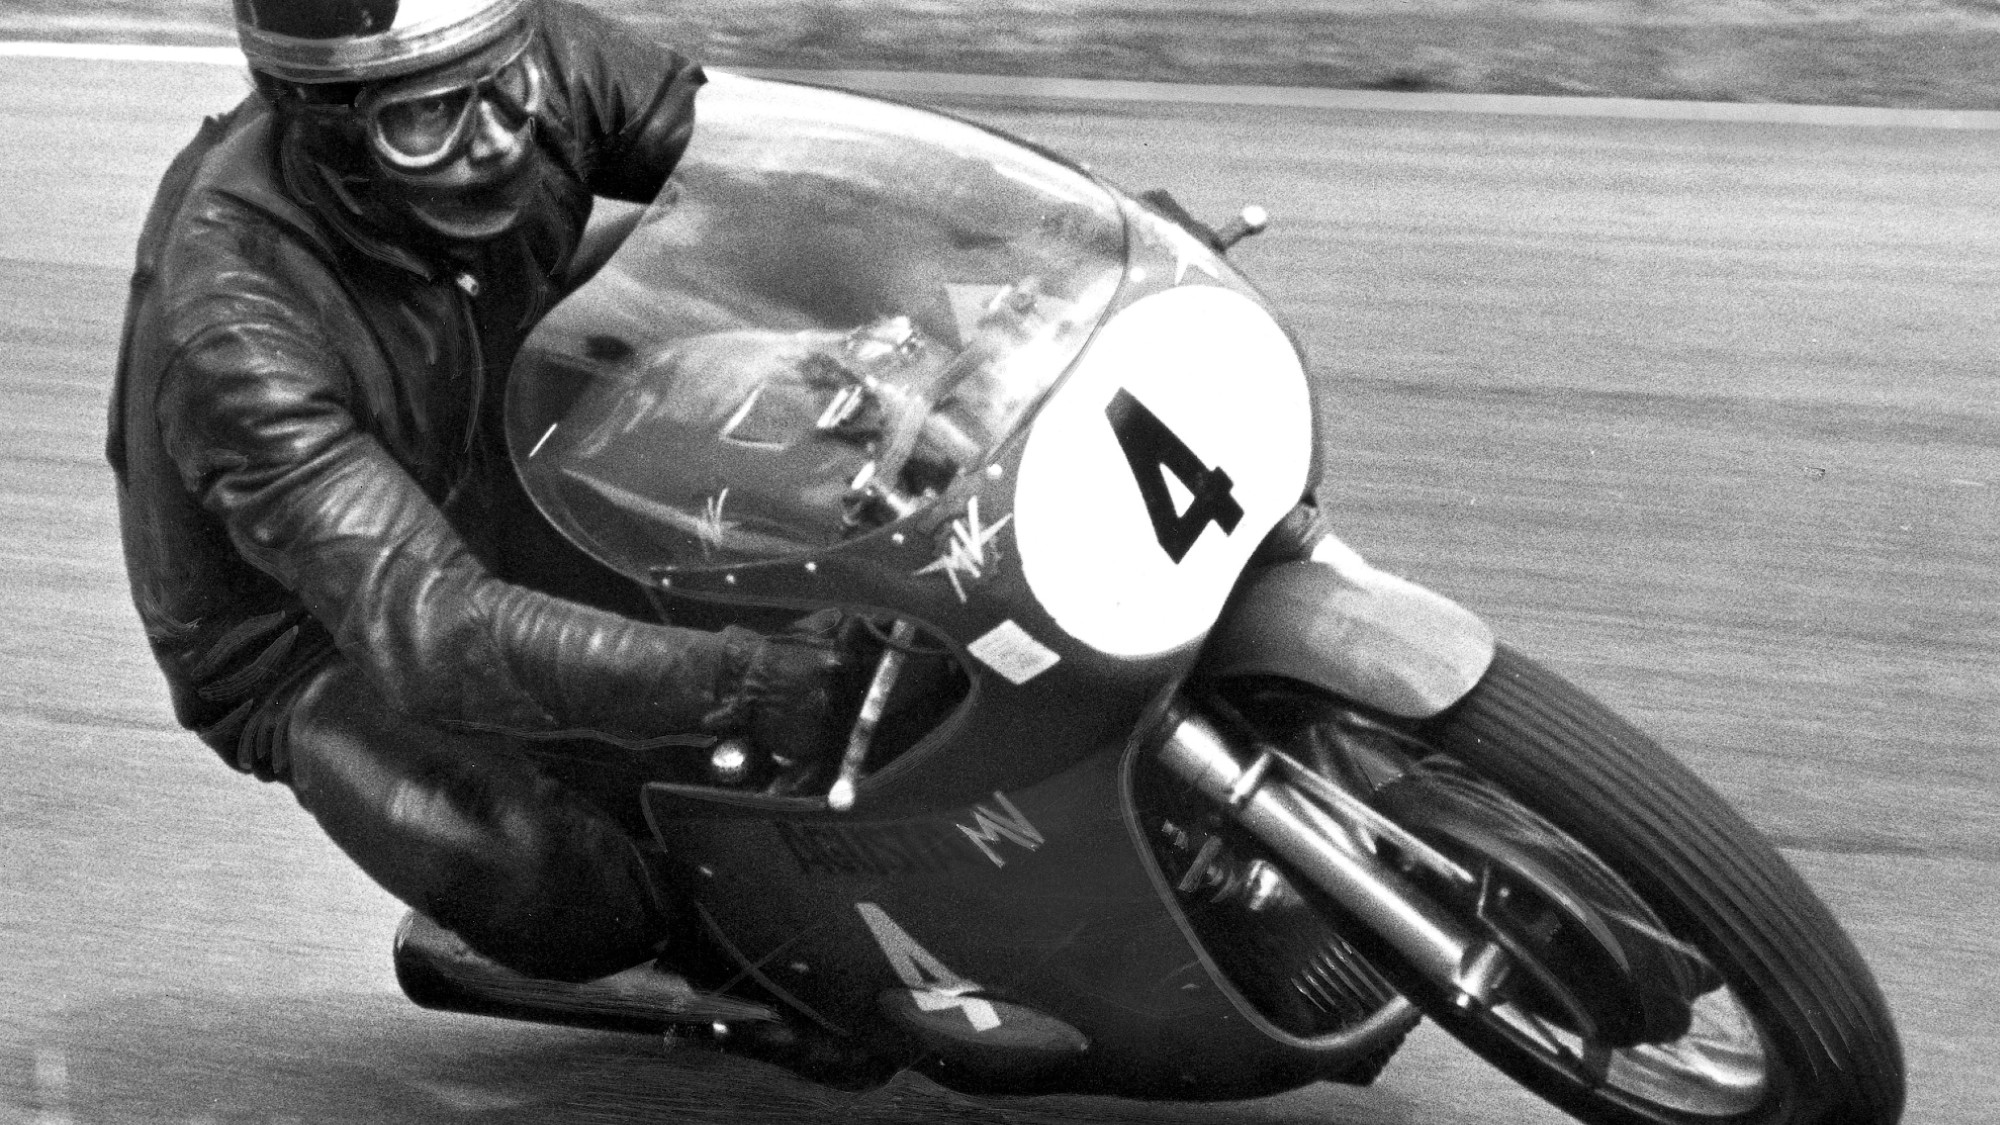 Giacomo Agostini, 1969 MV Agusta